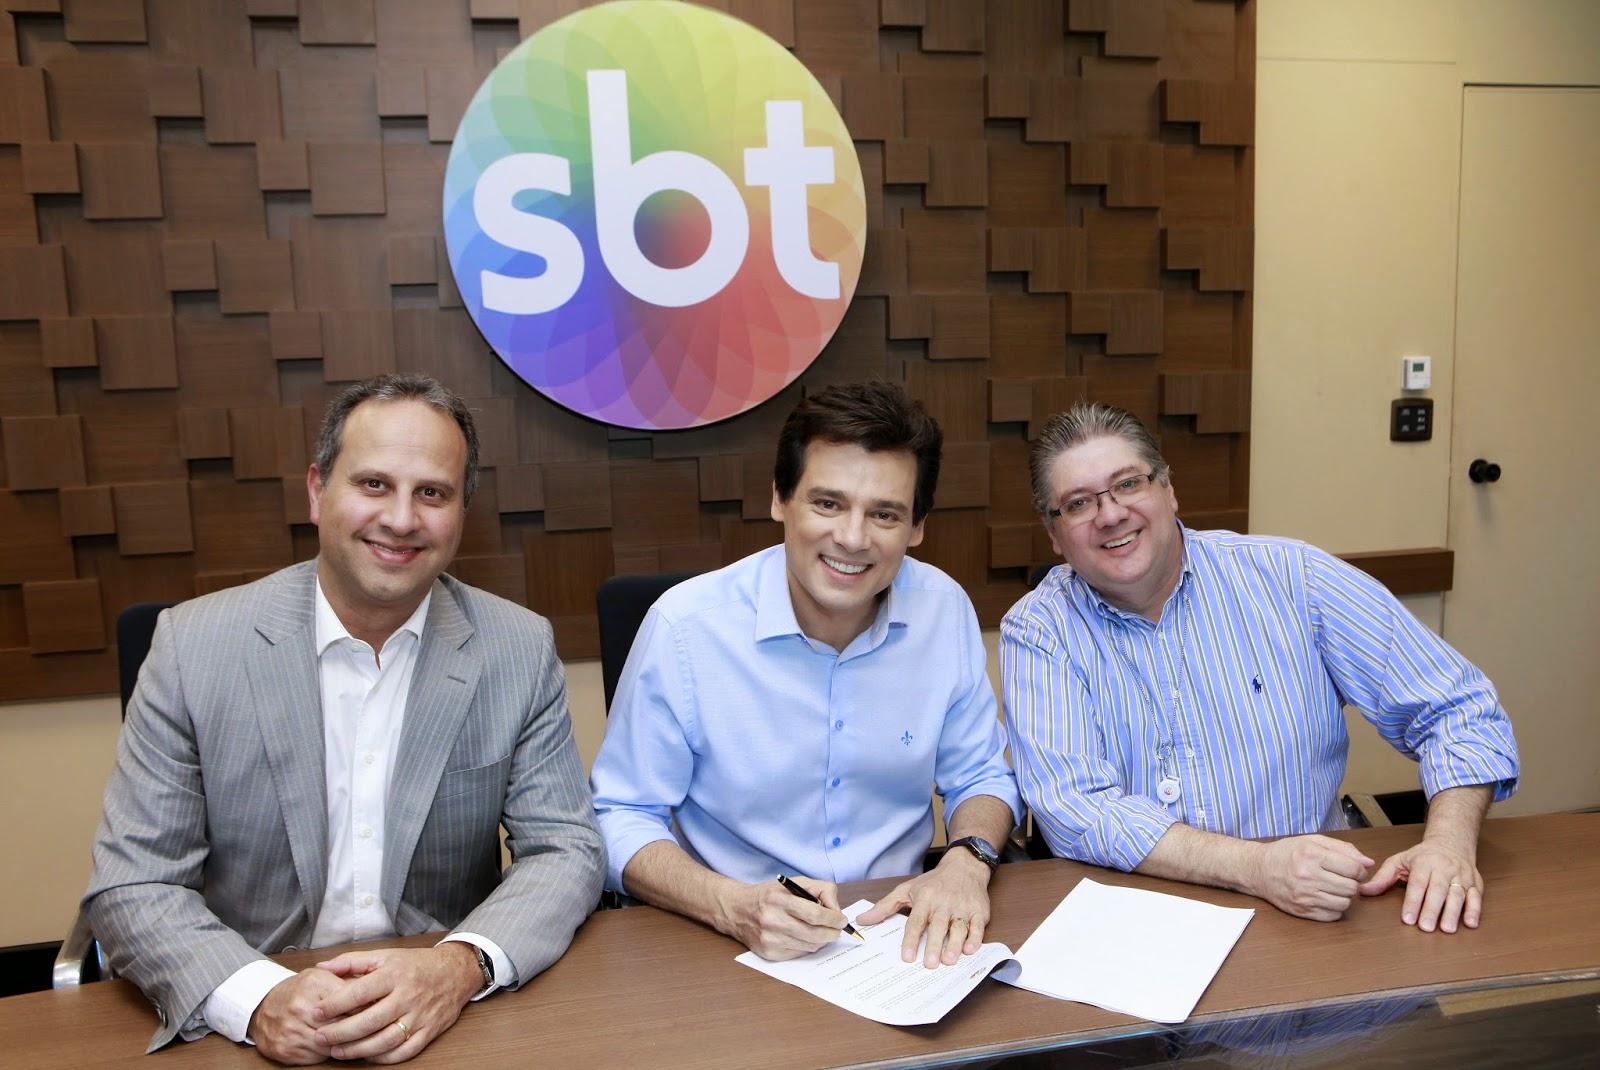 José Roberto Maciel, Vice Presidente do SBT ,Celso Portiolli e Leon Abravanel, diretor de Produções  (Crédito: Lourival Ribeiro/SBT)